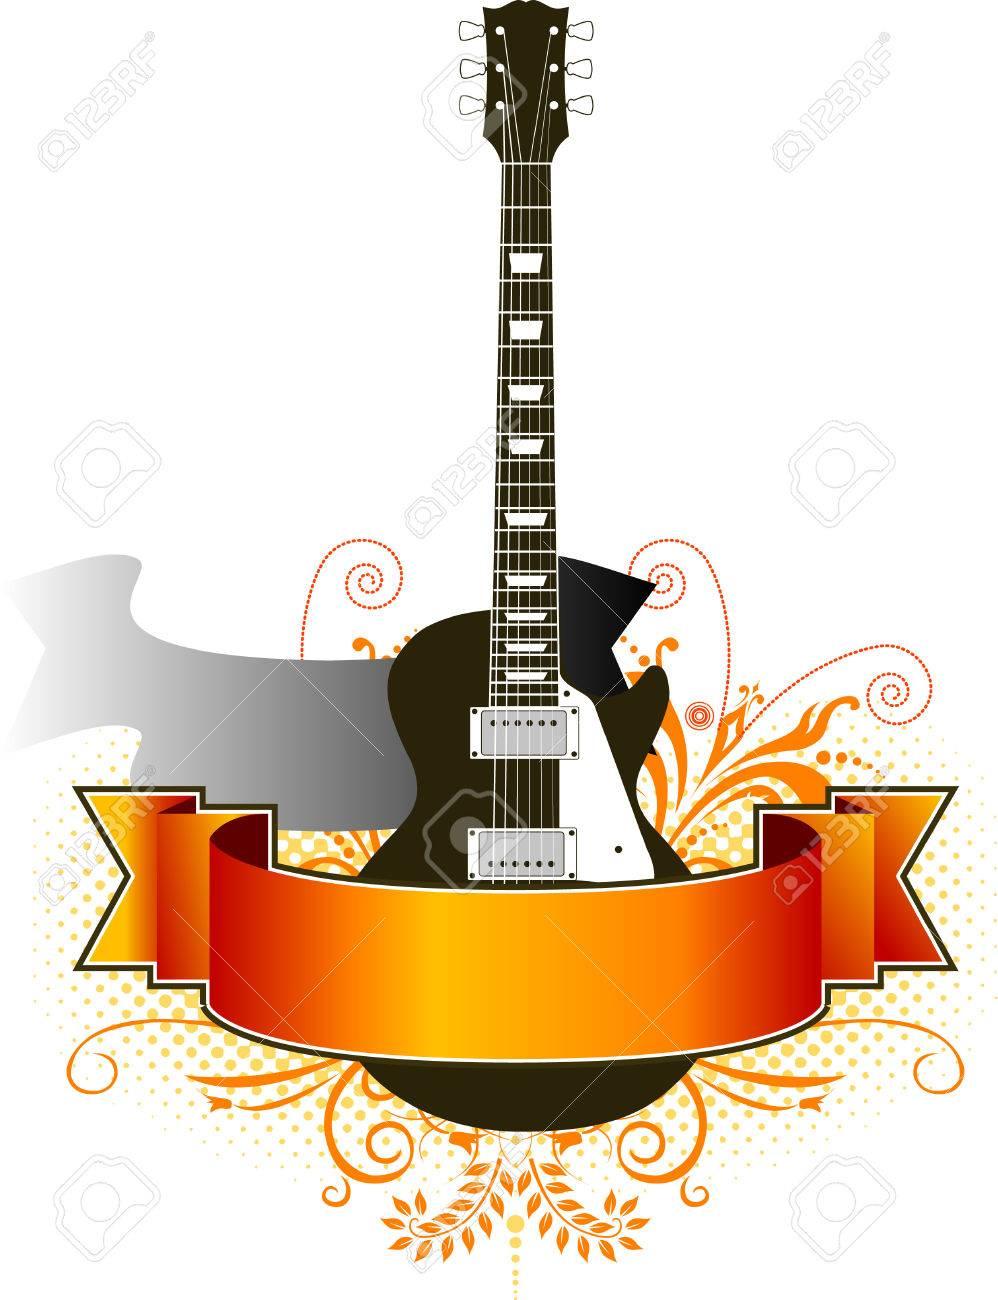 a funky grunge guitar